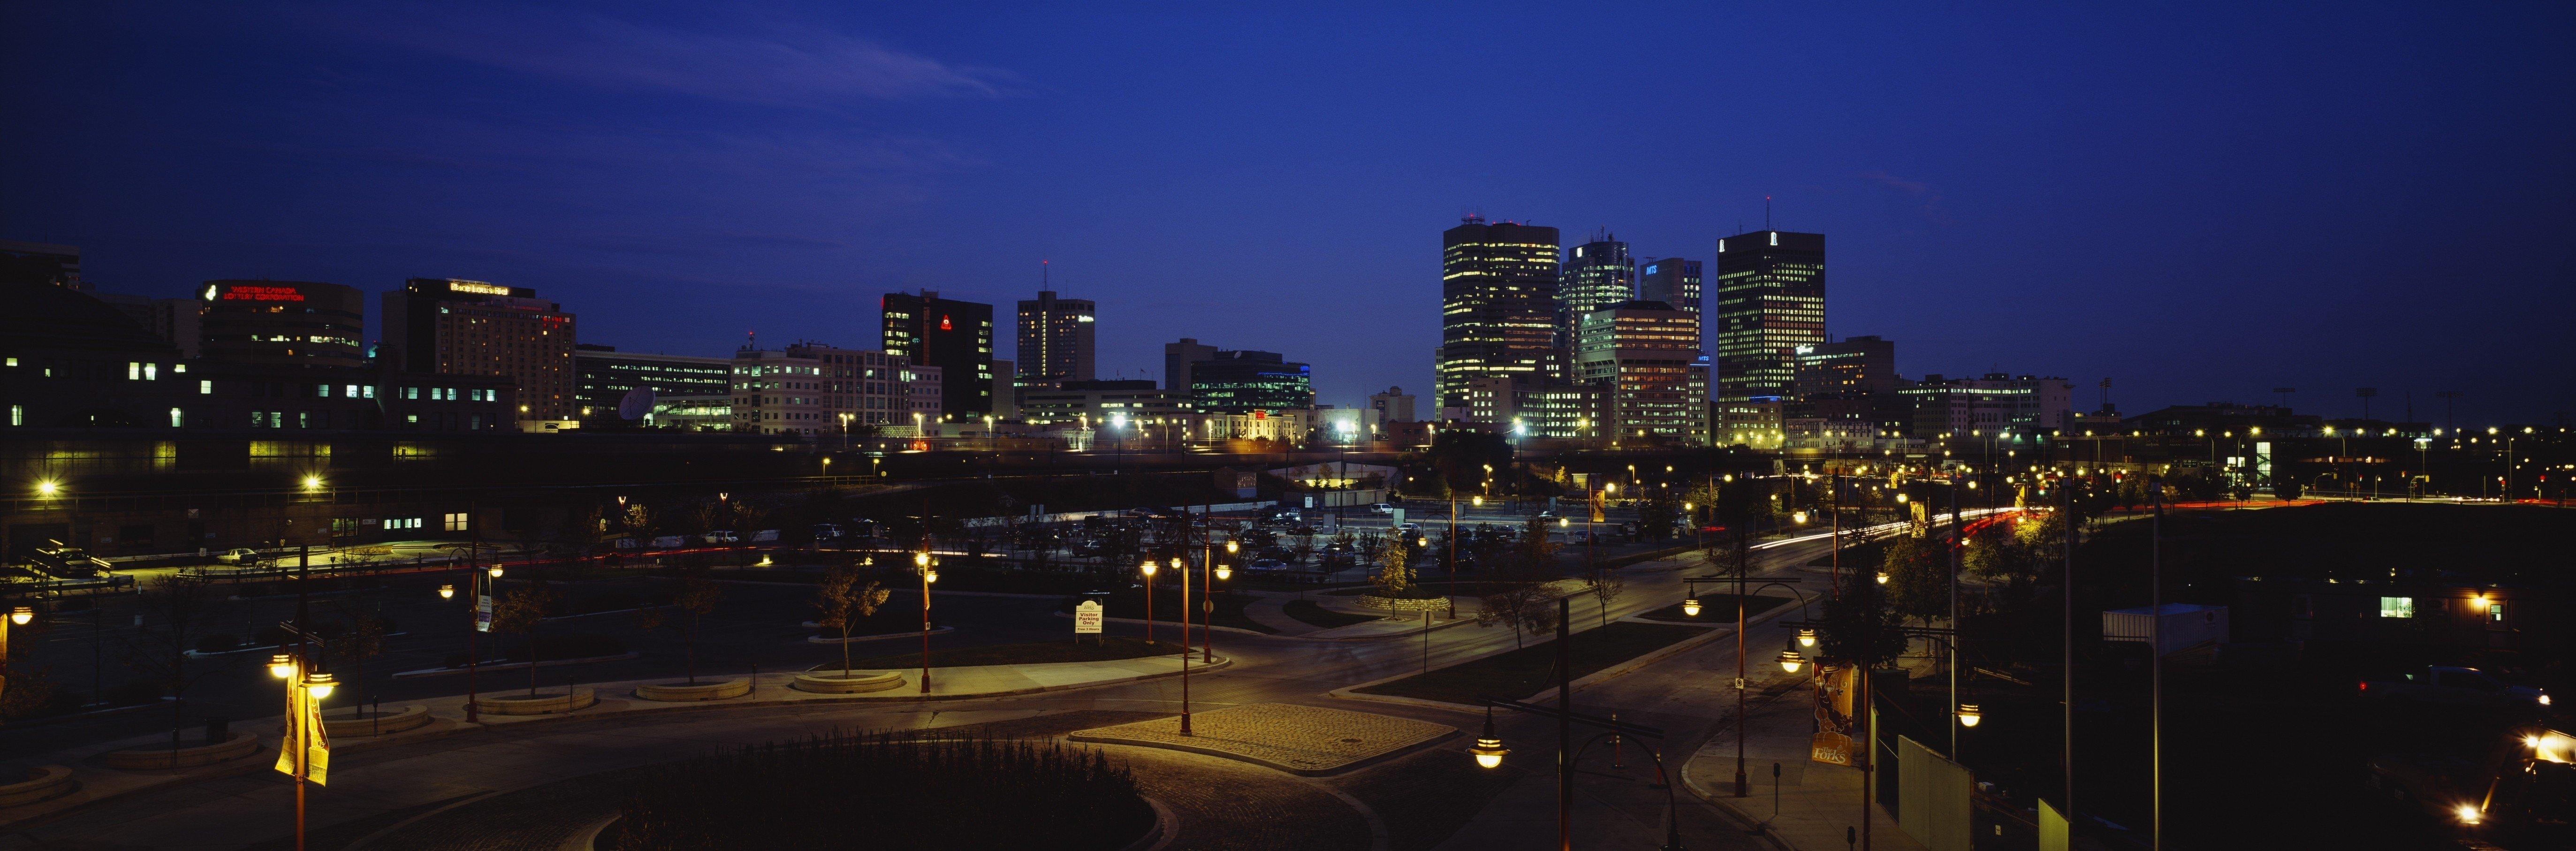 Buildings Lit Up At Night, Winnipeg, Manitoba, Canada